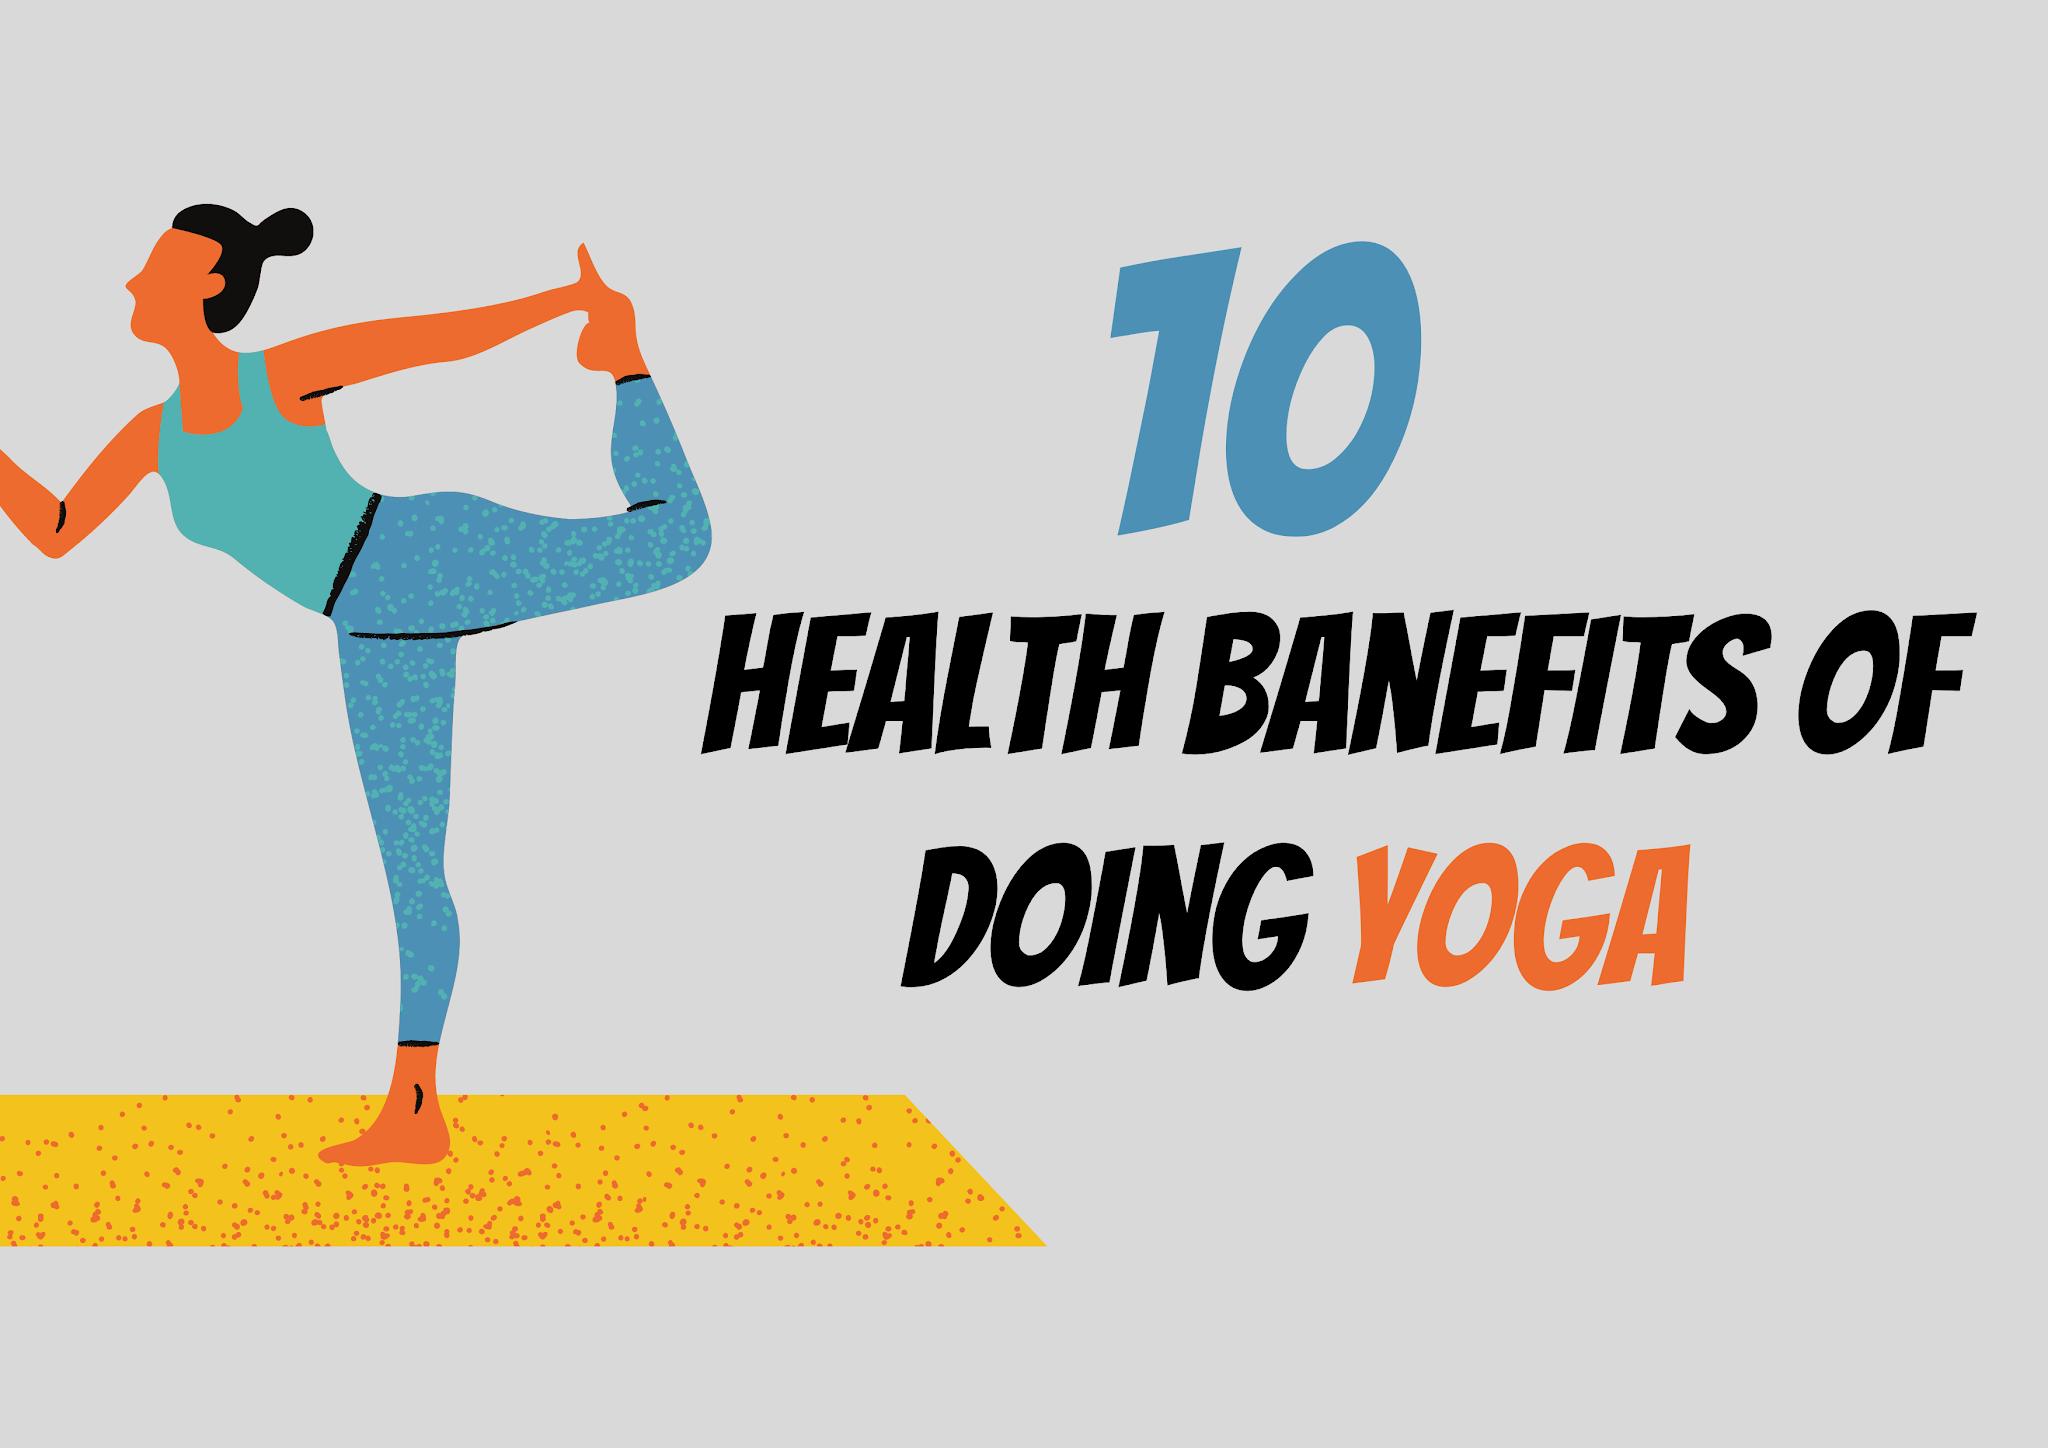 Top 10 Health Benefits of Doing Yoga